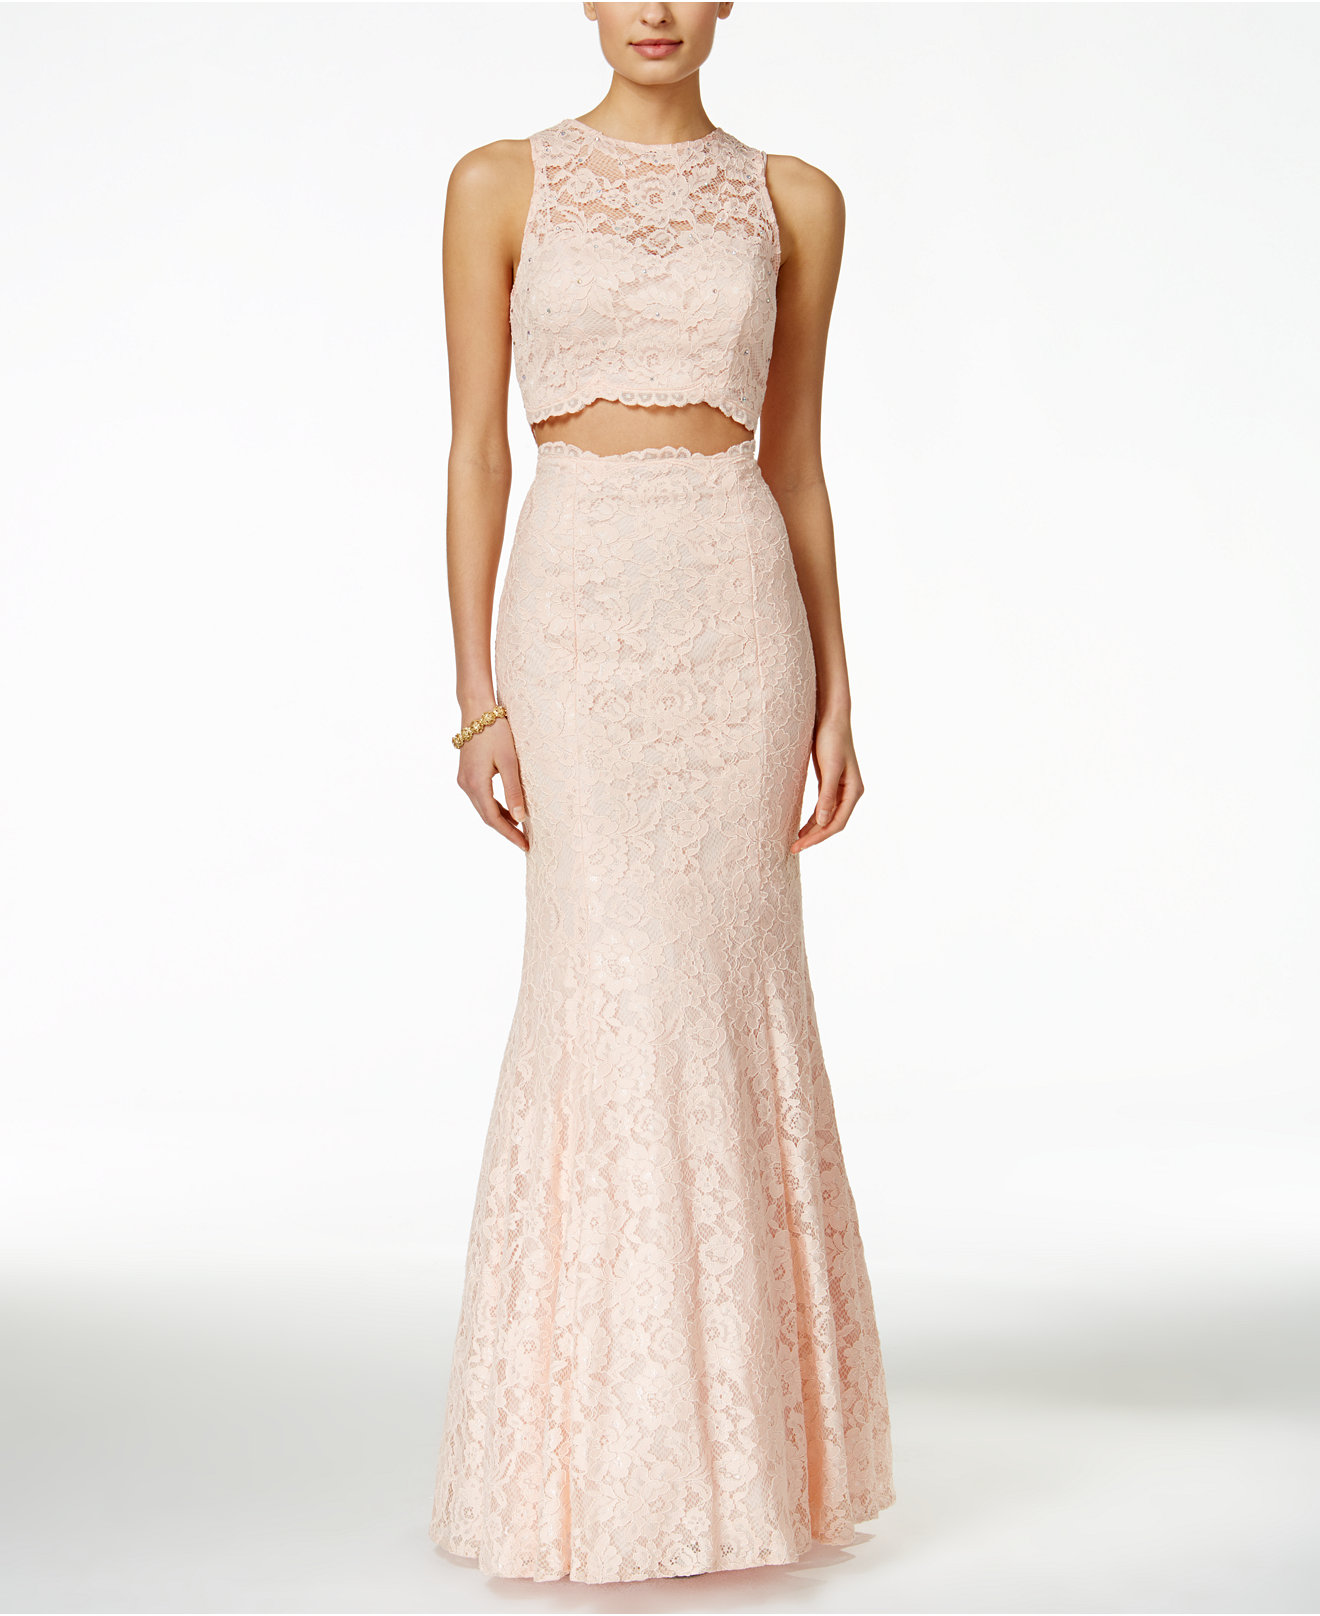 macys bridesmaid dresses photo - 1